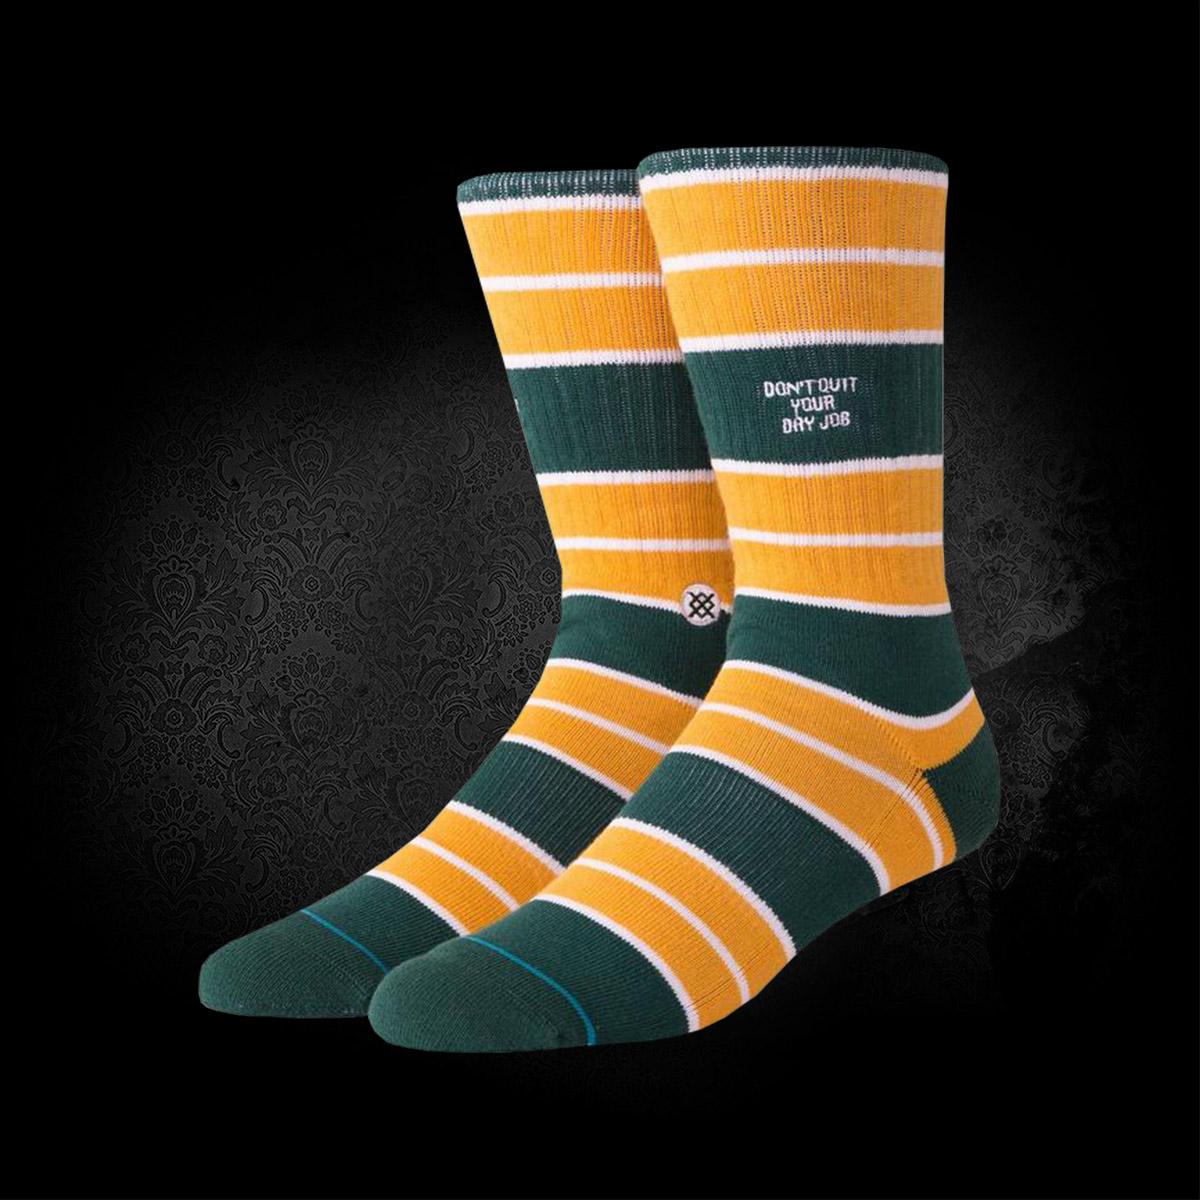 STANCE Čarape DONT QUIT